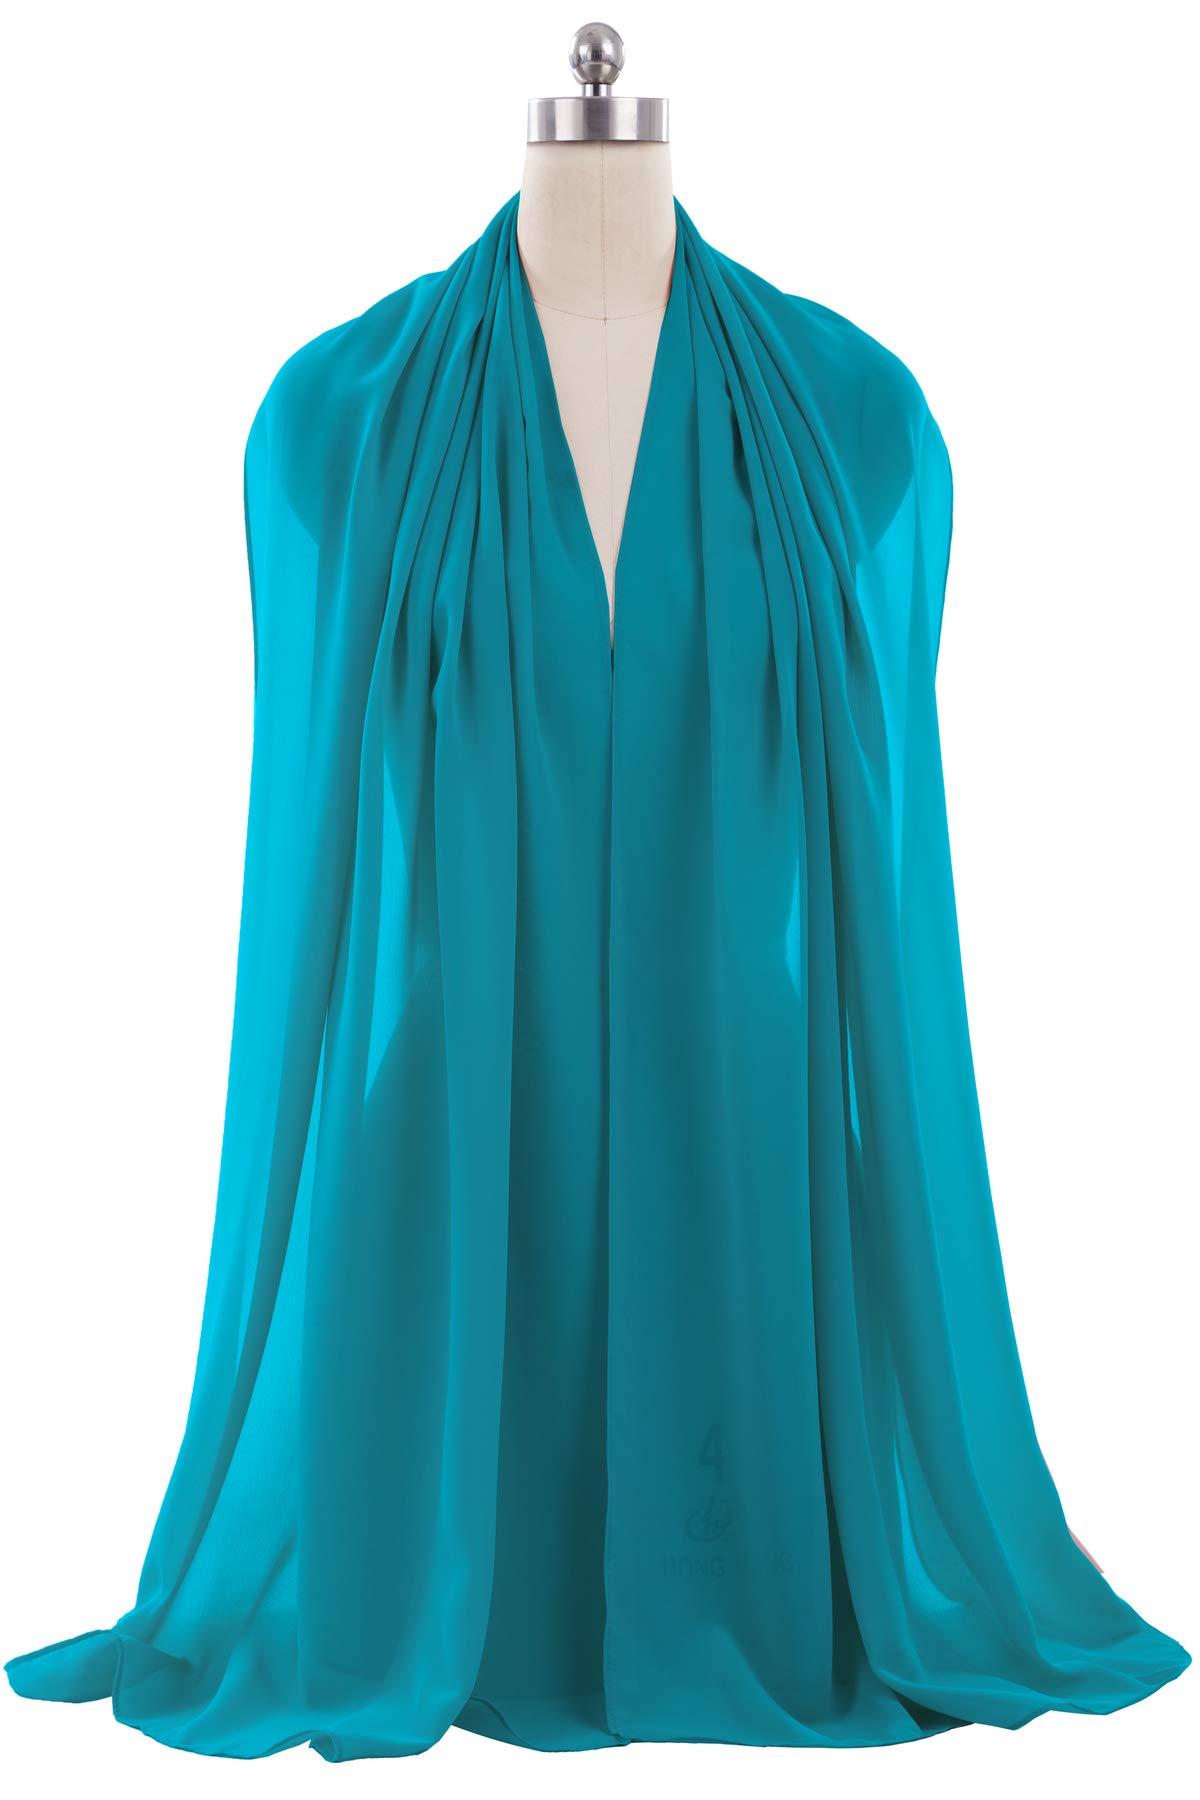 ANTS Women's Chiffon Bridal Evening Dresses Shawl Wraps Color Teal Blue Size 18''x78''